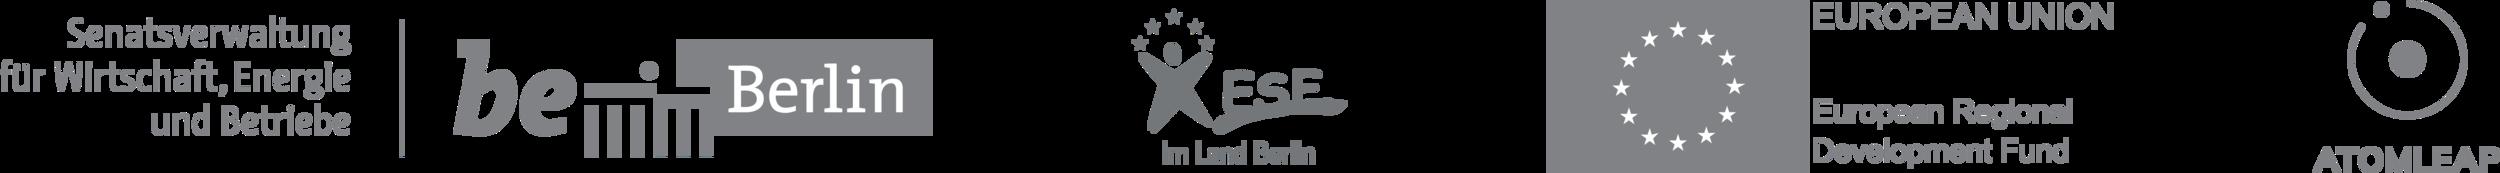 logos_grey_footer_ESF.png